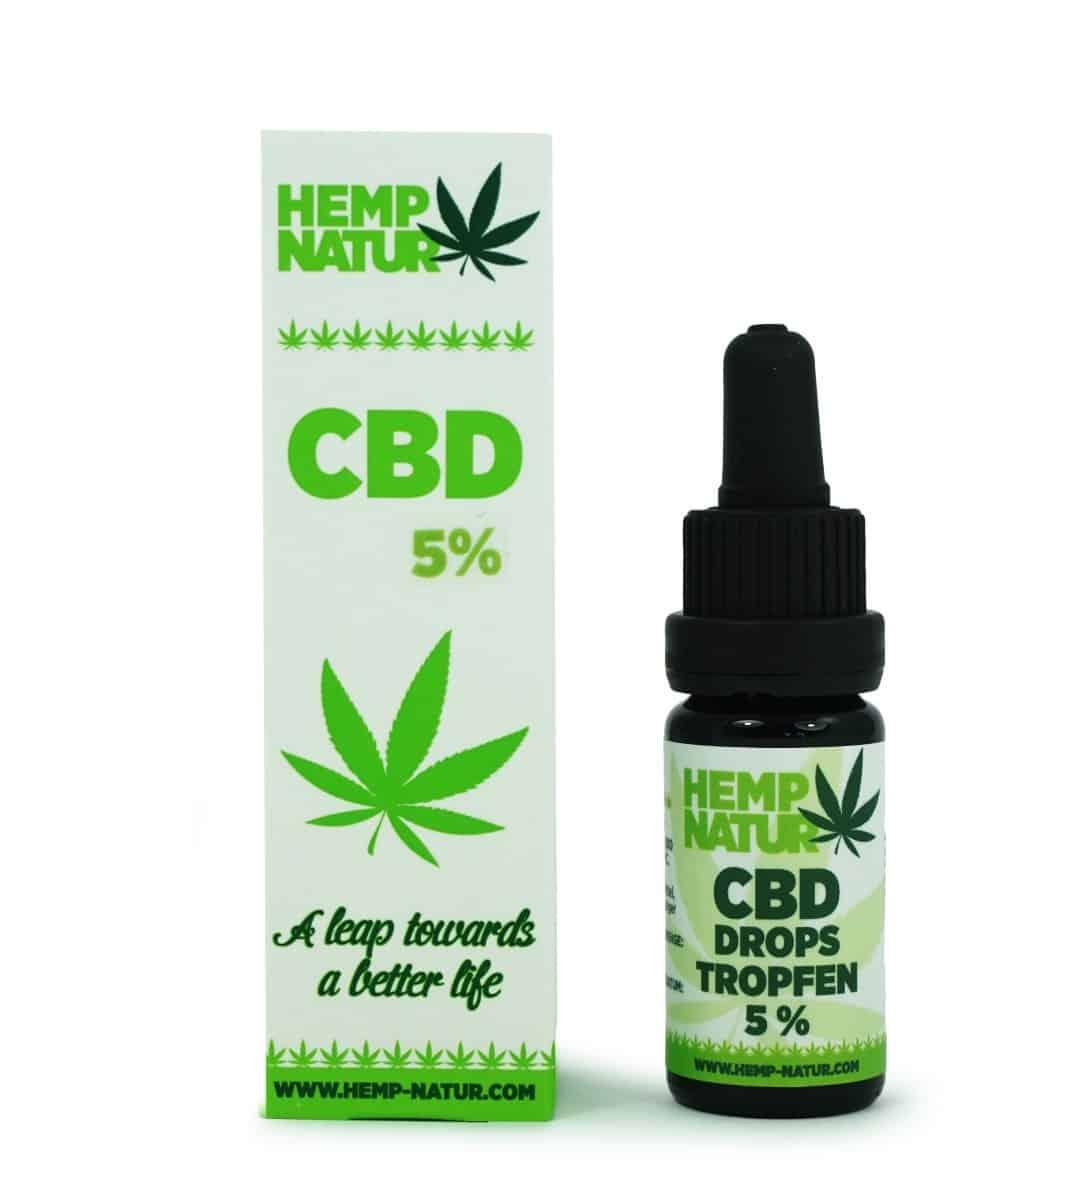 Hemp Natur Coupon Code Online Discount Save On Cannabis